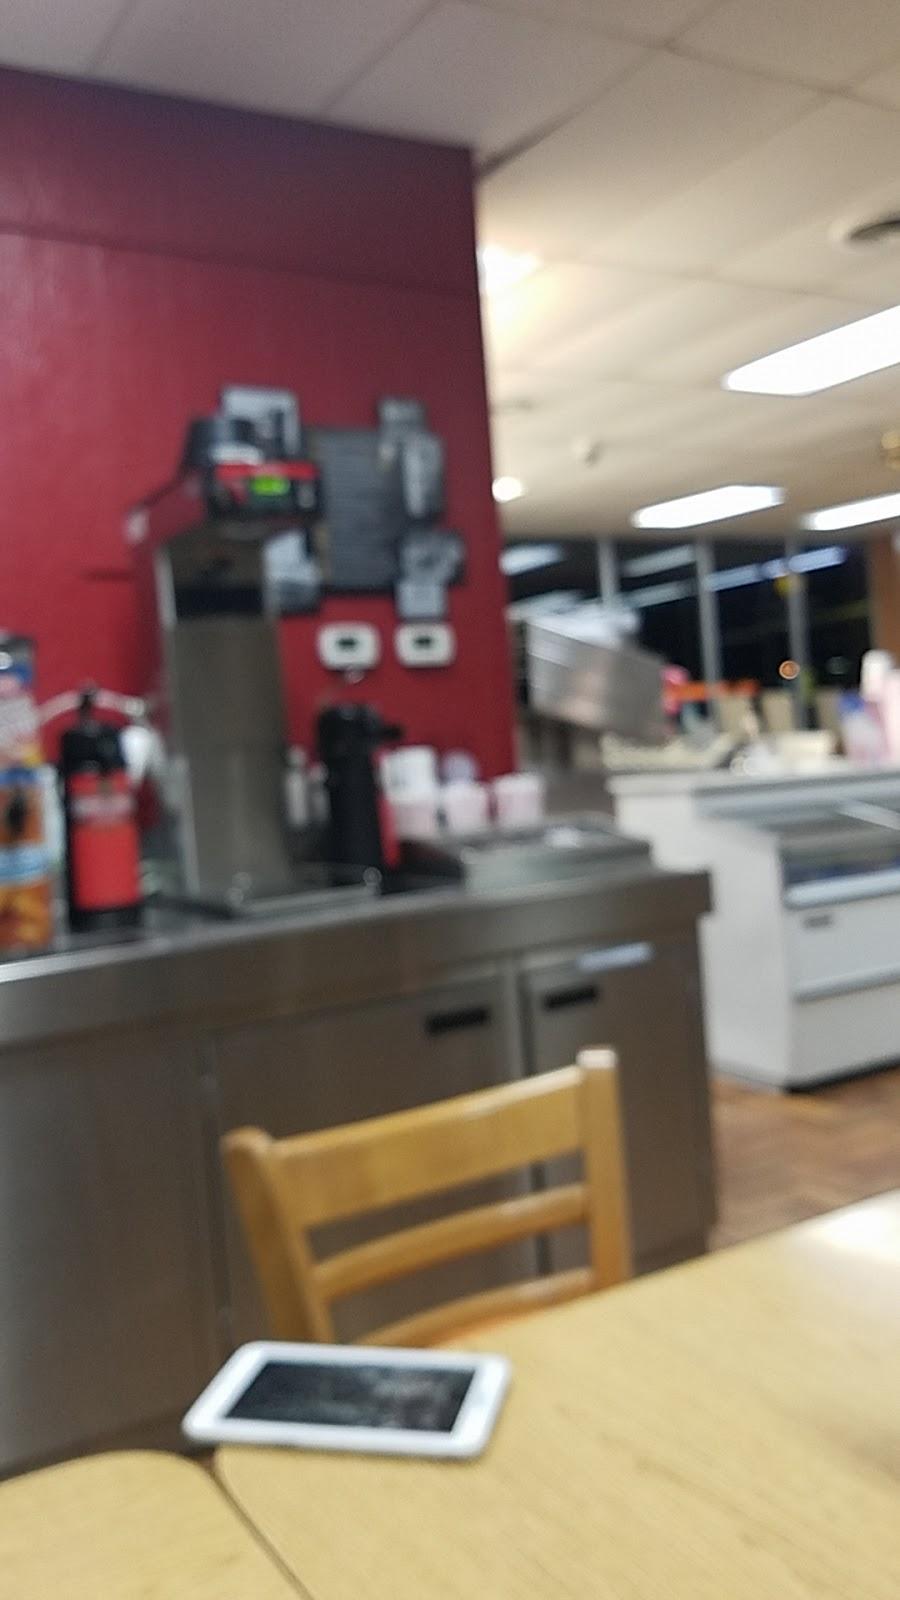 Dairy Queen Store - restaurant    Photo 7 of 10   Address: 927 E Omega St, Henrietta, TX 76365, USA   Phone: (940) 538-4411